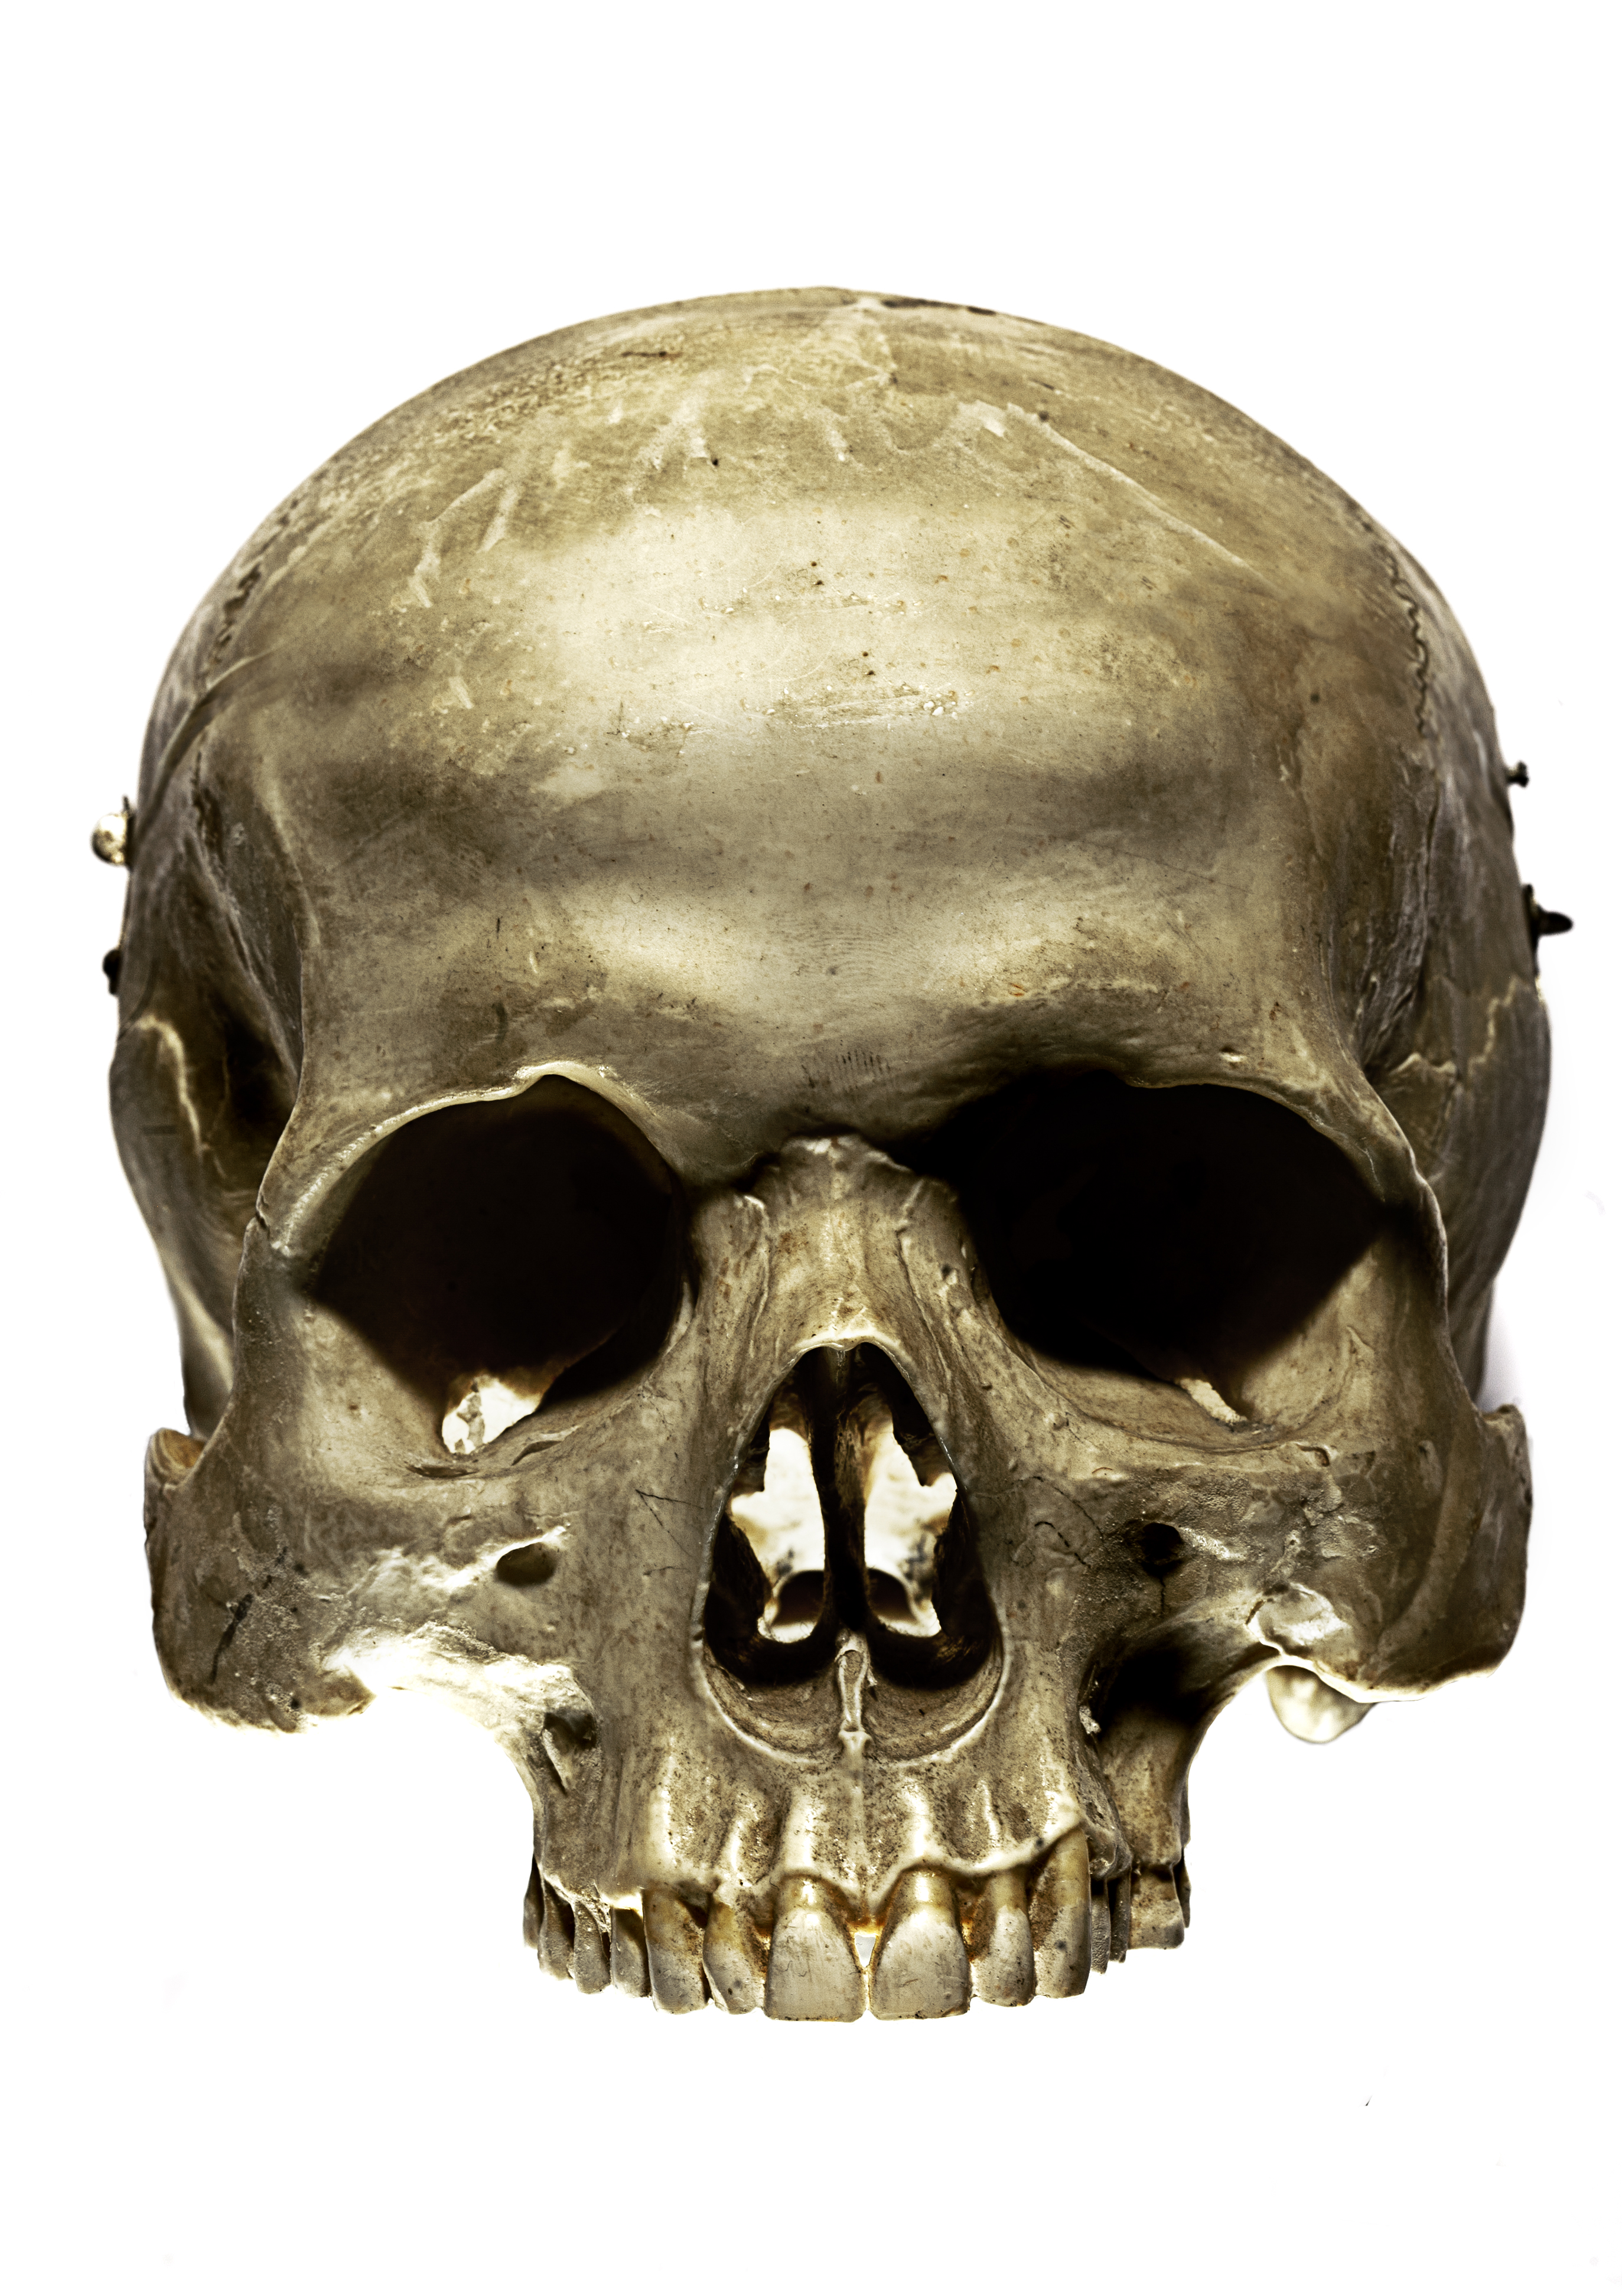 Skull Backgrounds on Wallpapers Vista